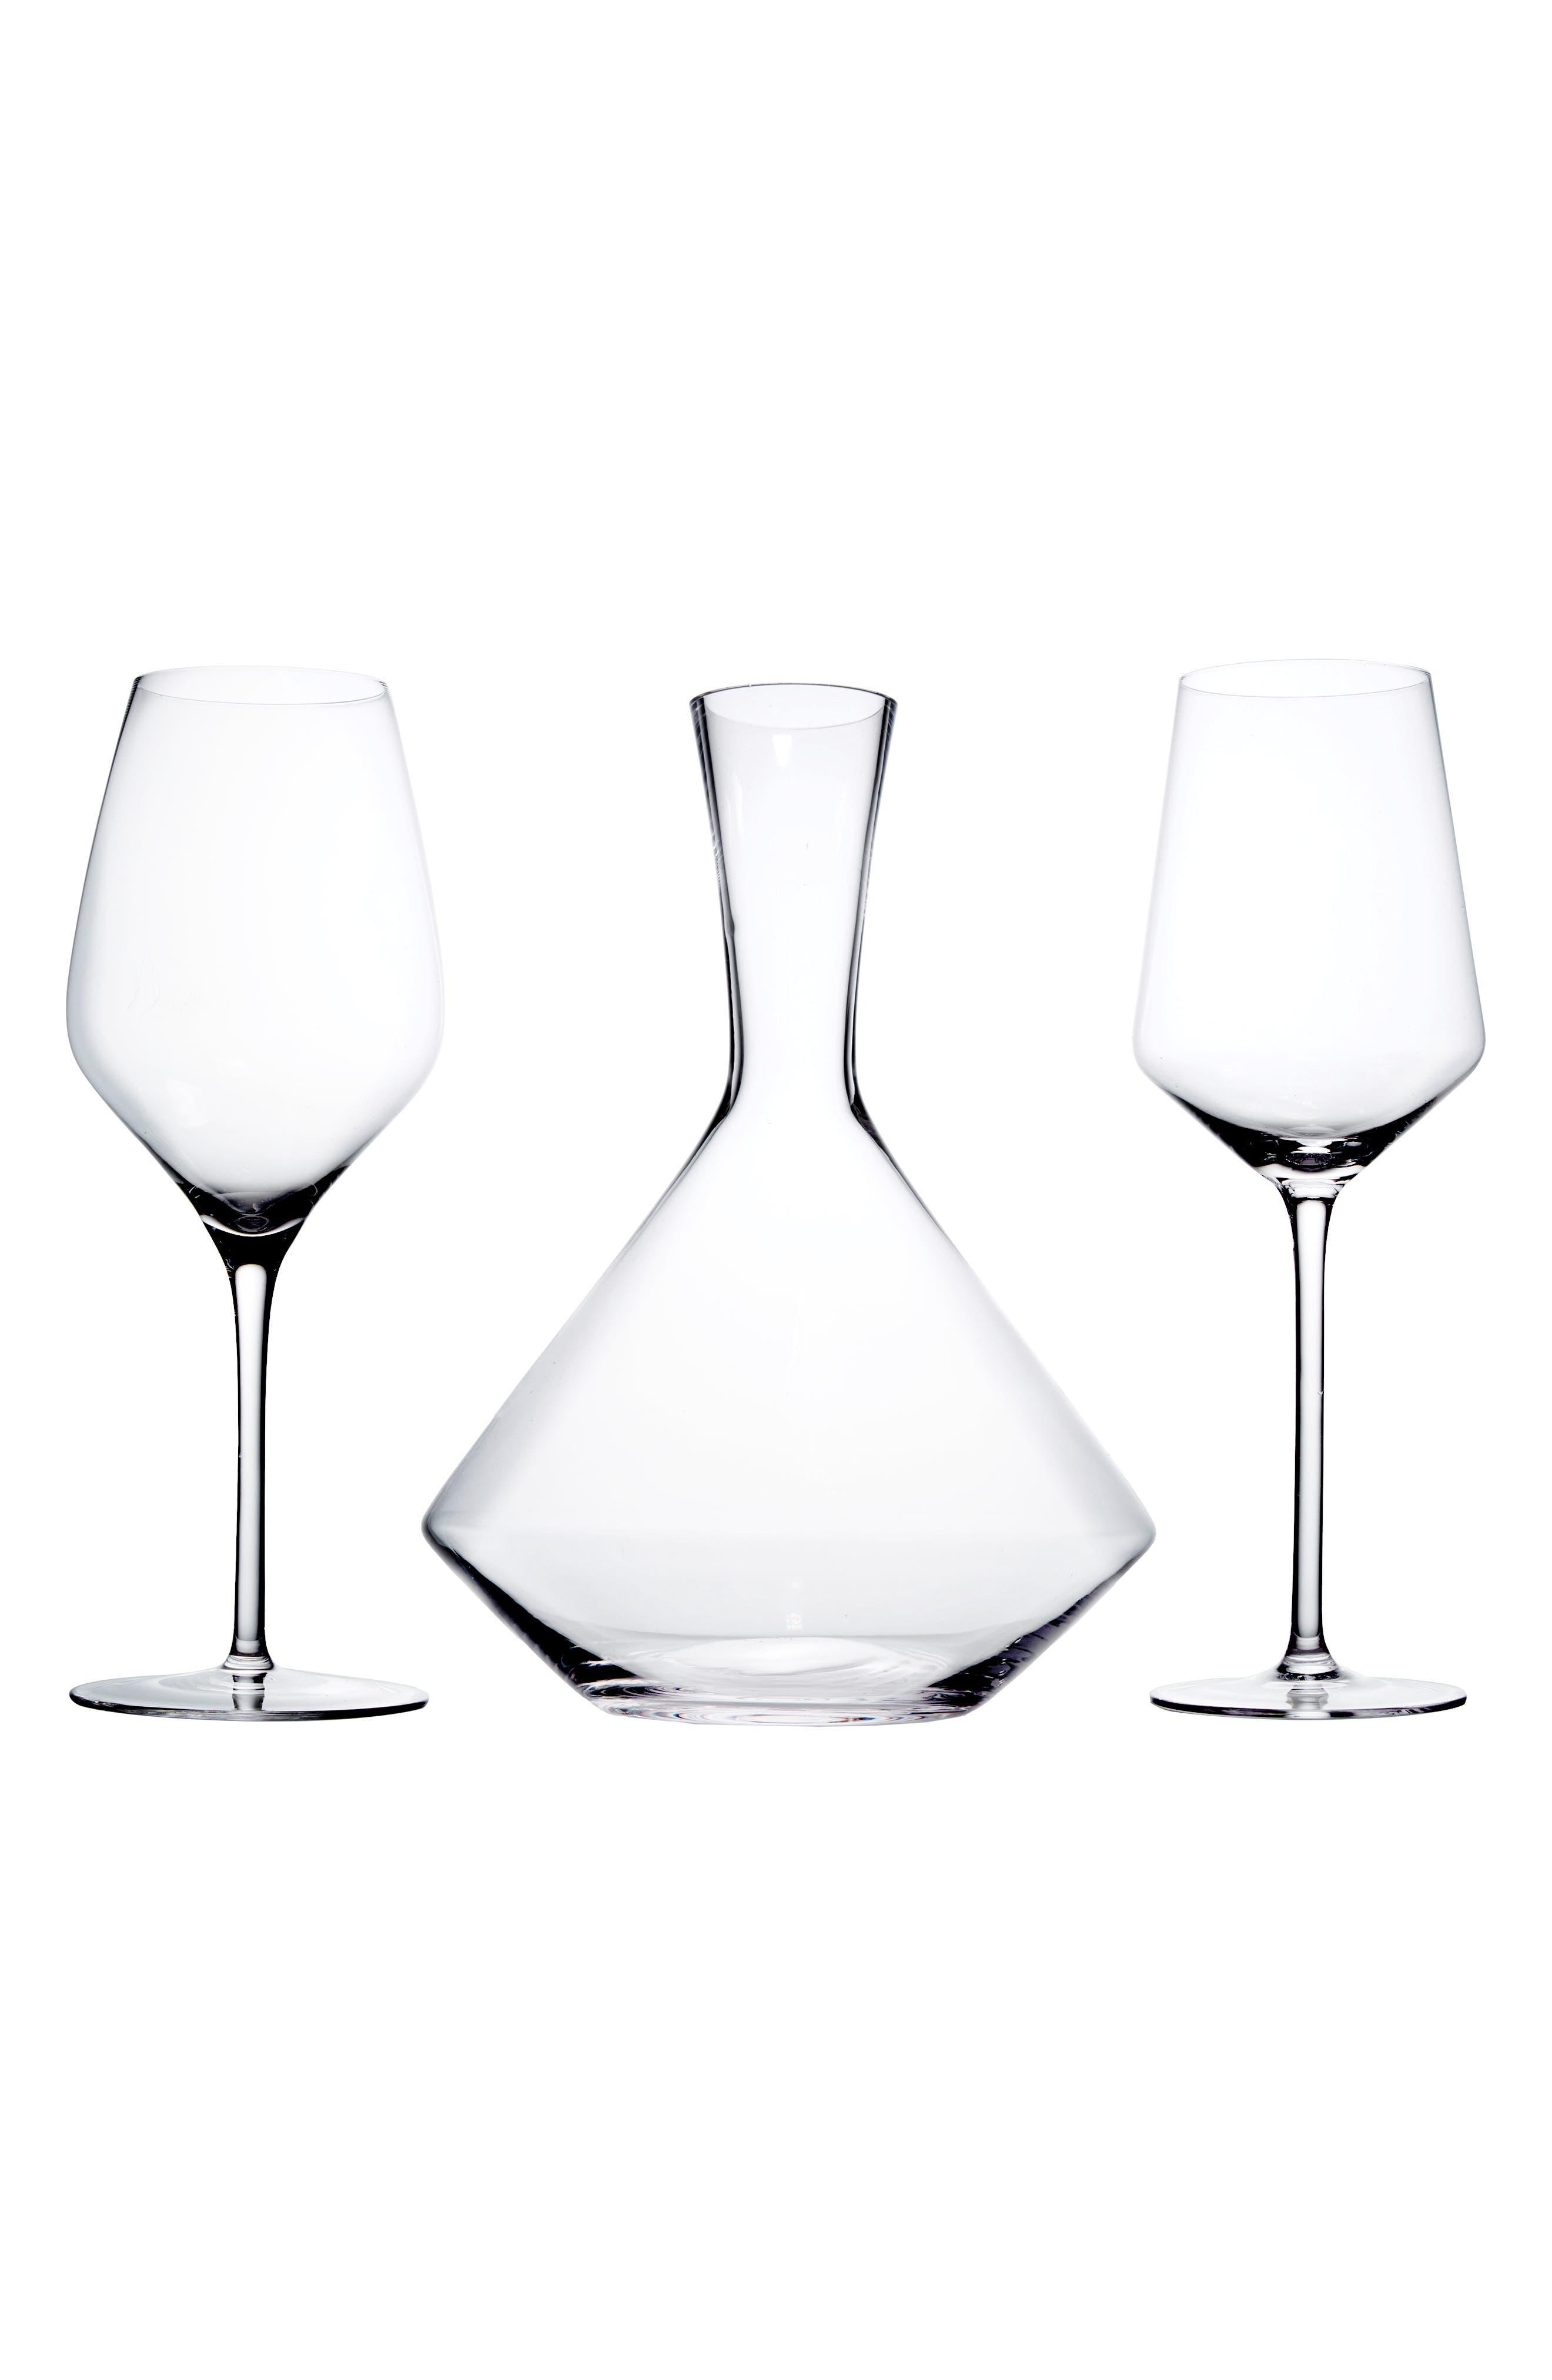 Main Image - Viski by True Fabrications Raye Bordeaux 3-Piece Decanter Set